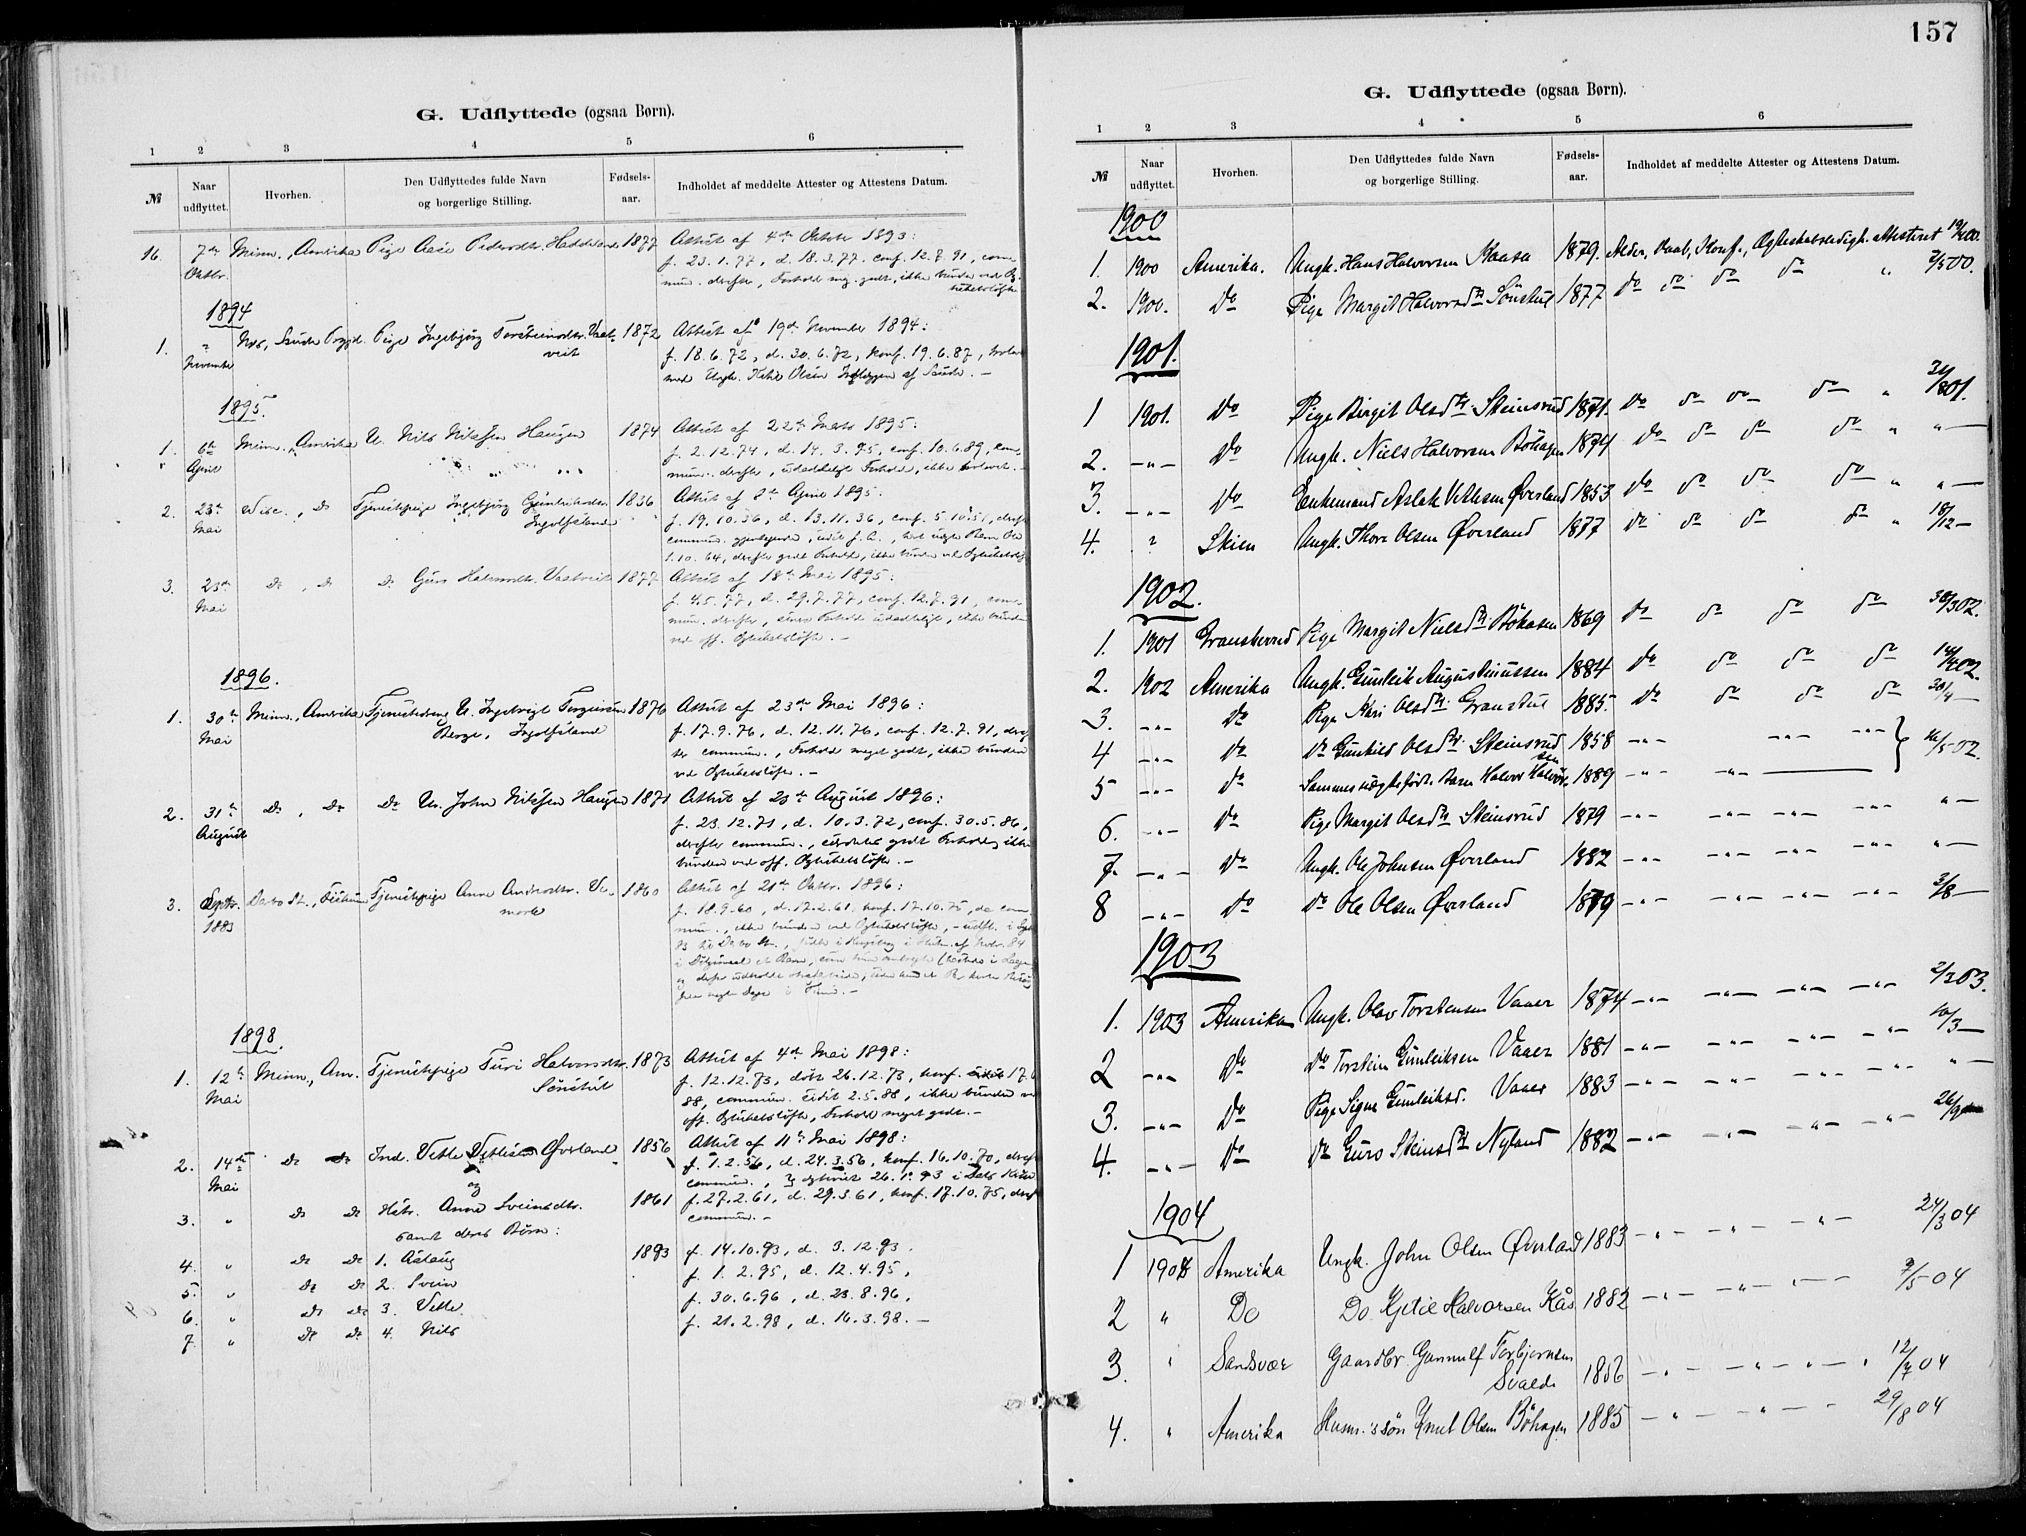 SAKO, Rjukan kirkebøker, F/Fa/L0001: Ministerialbok nr. 1, 1878-1912, s. 157